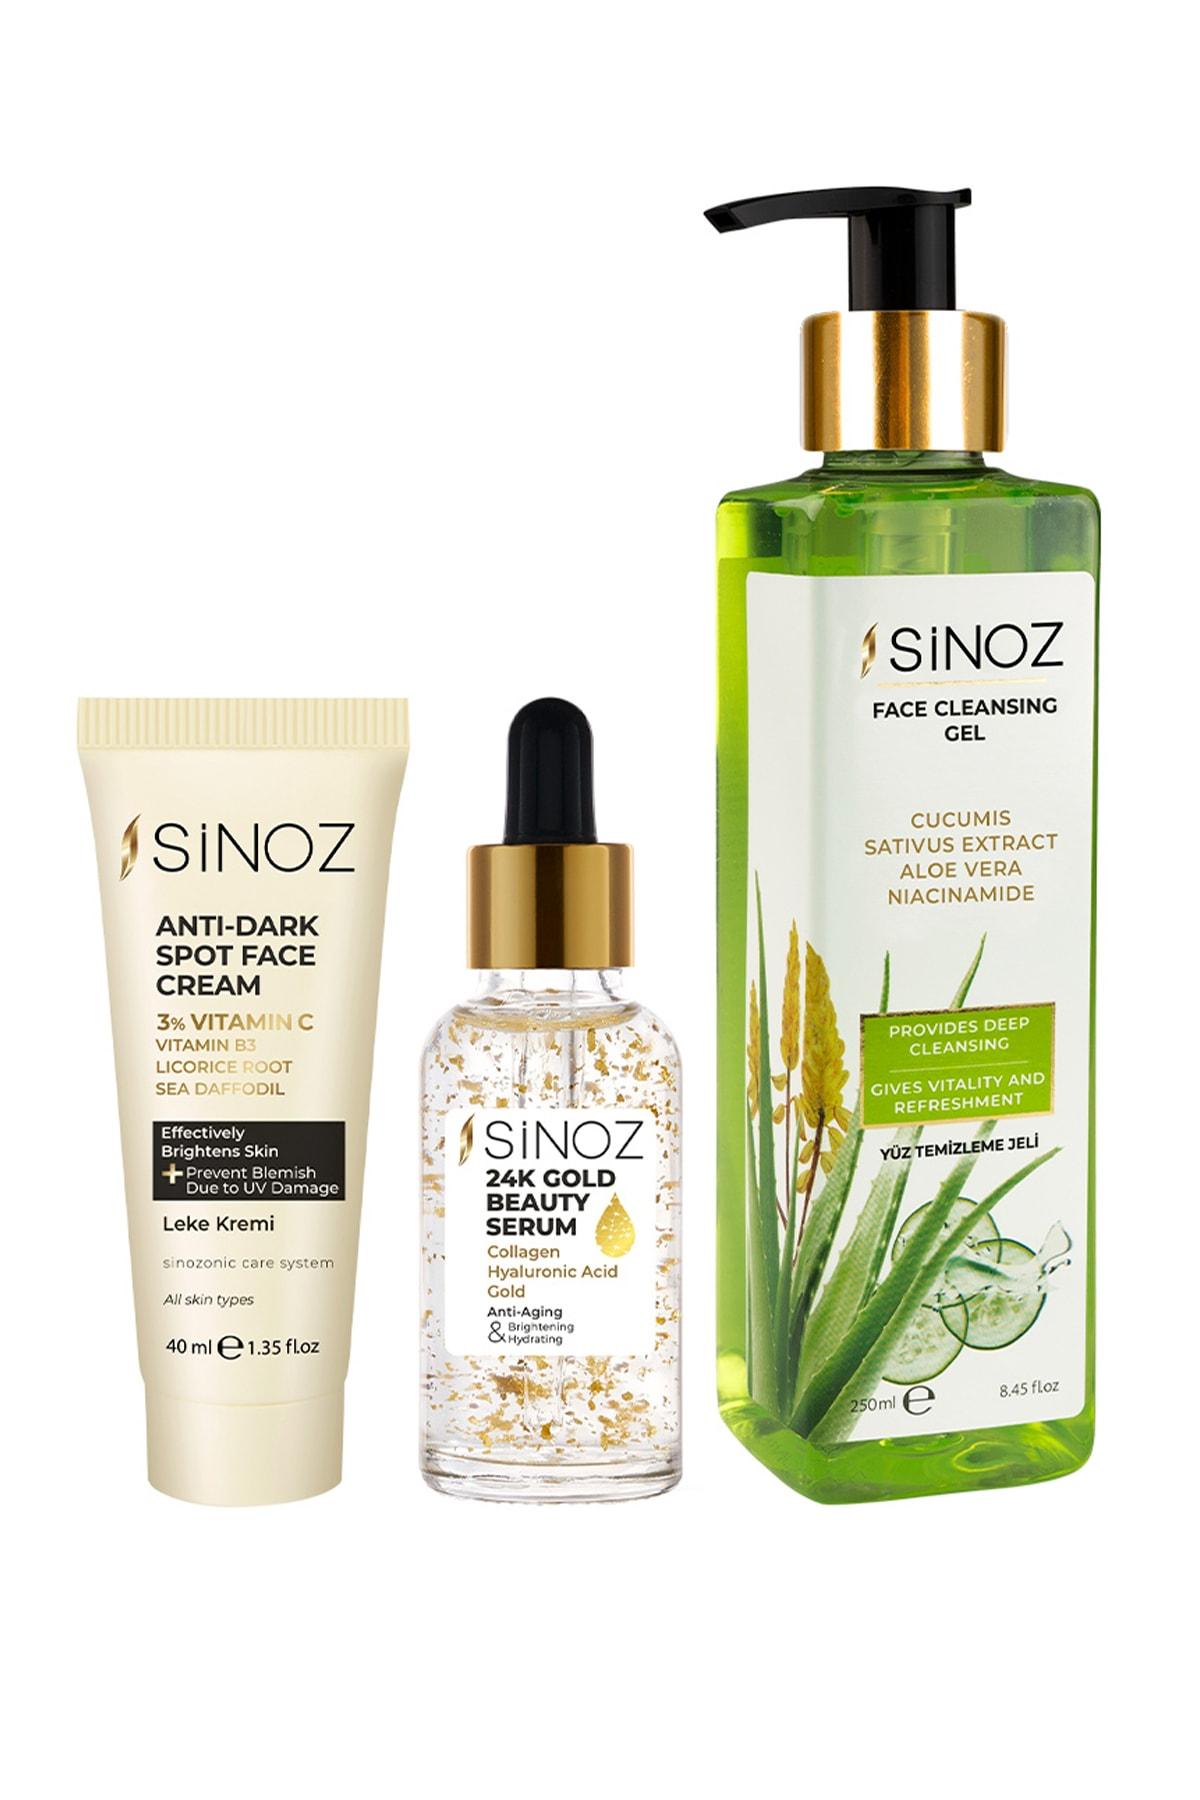 Sinoz blemish cream 40 Ml + 24k gold beauty Serum + 30 Ml + facial cleanser gel-bioaqua cosmetic cosmetic Protein for face